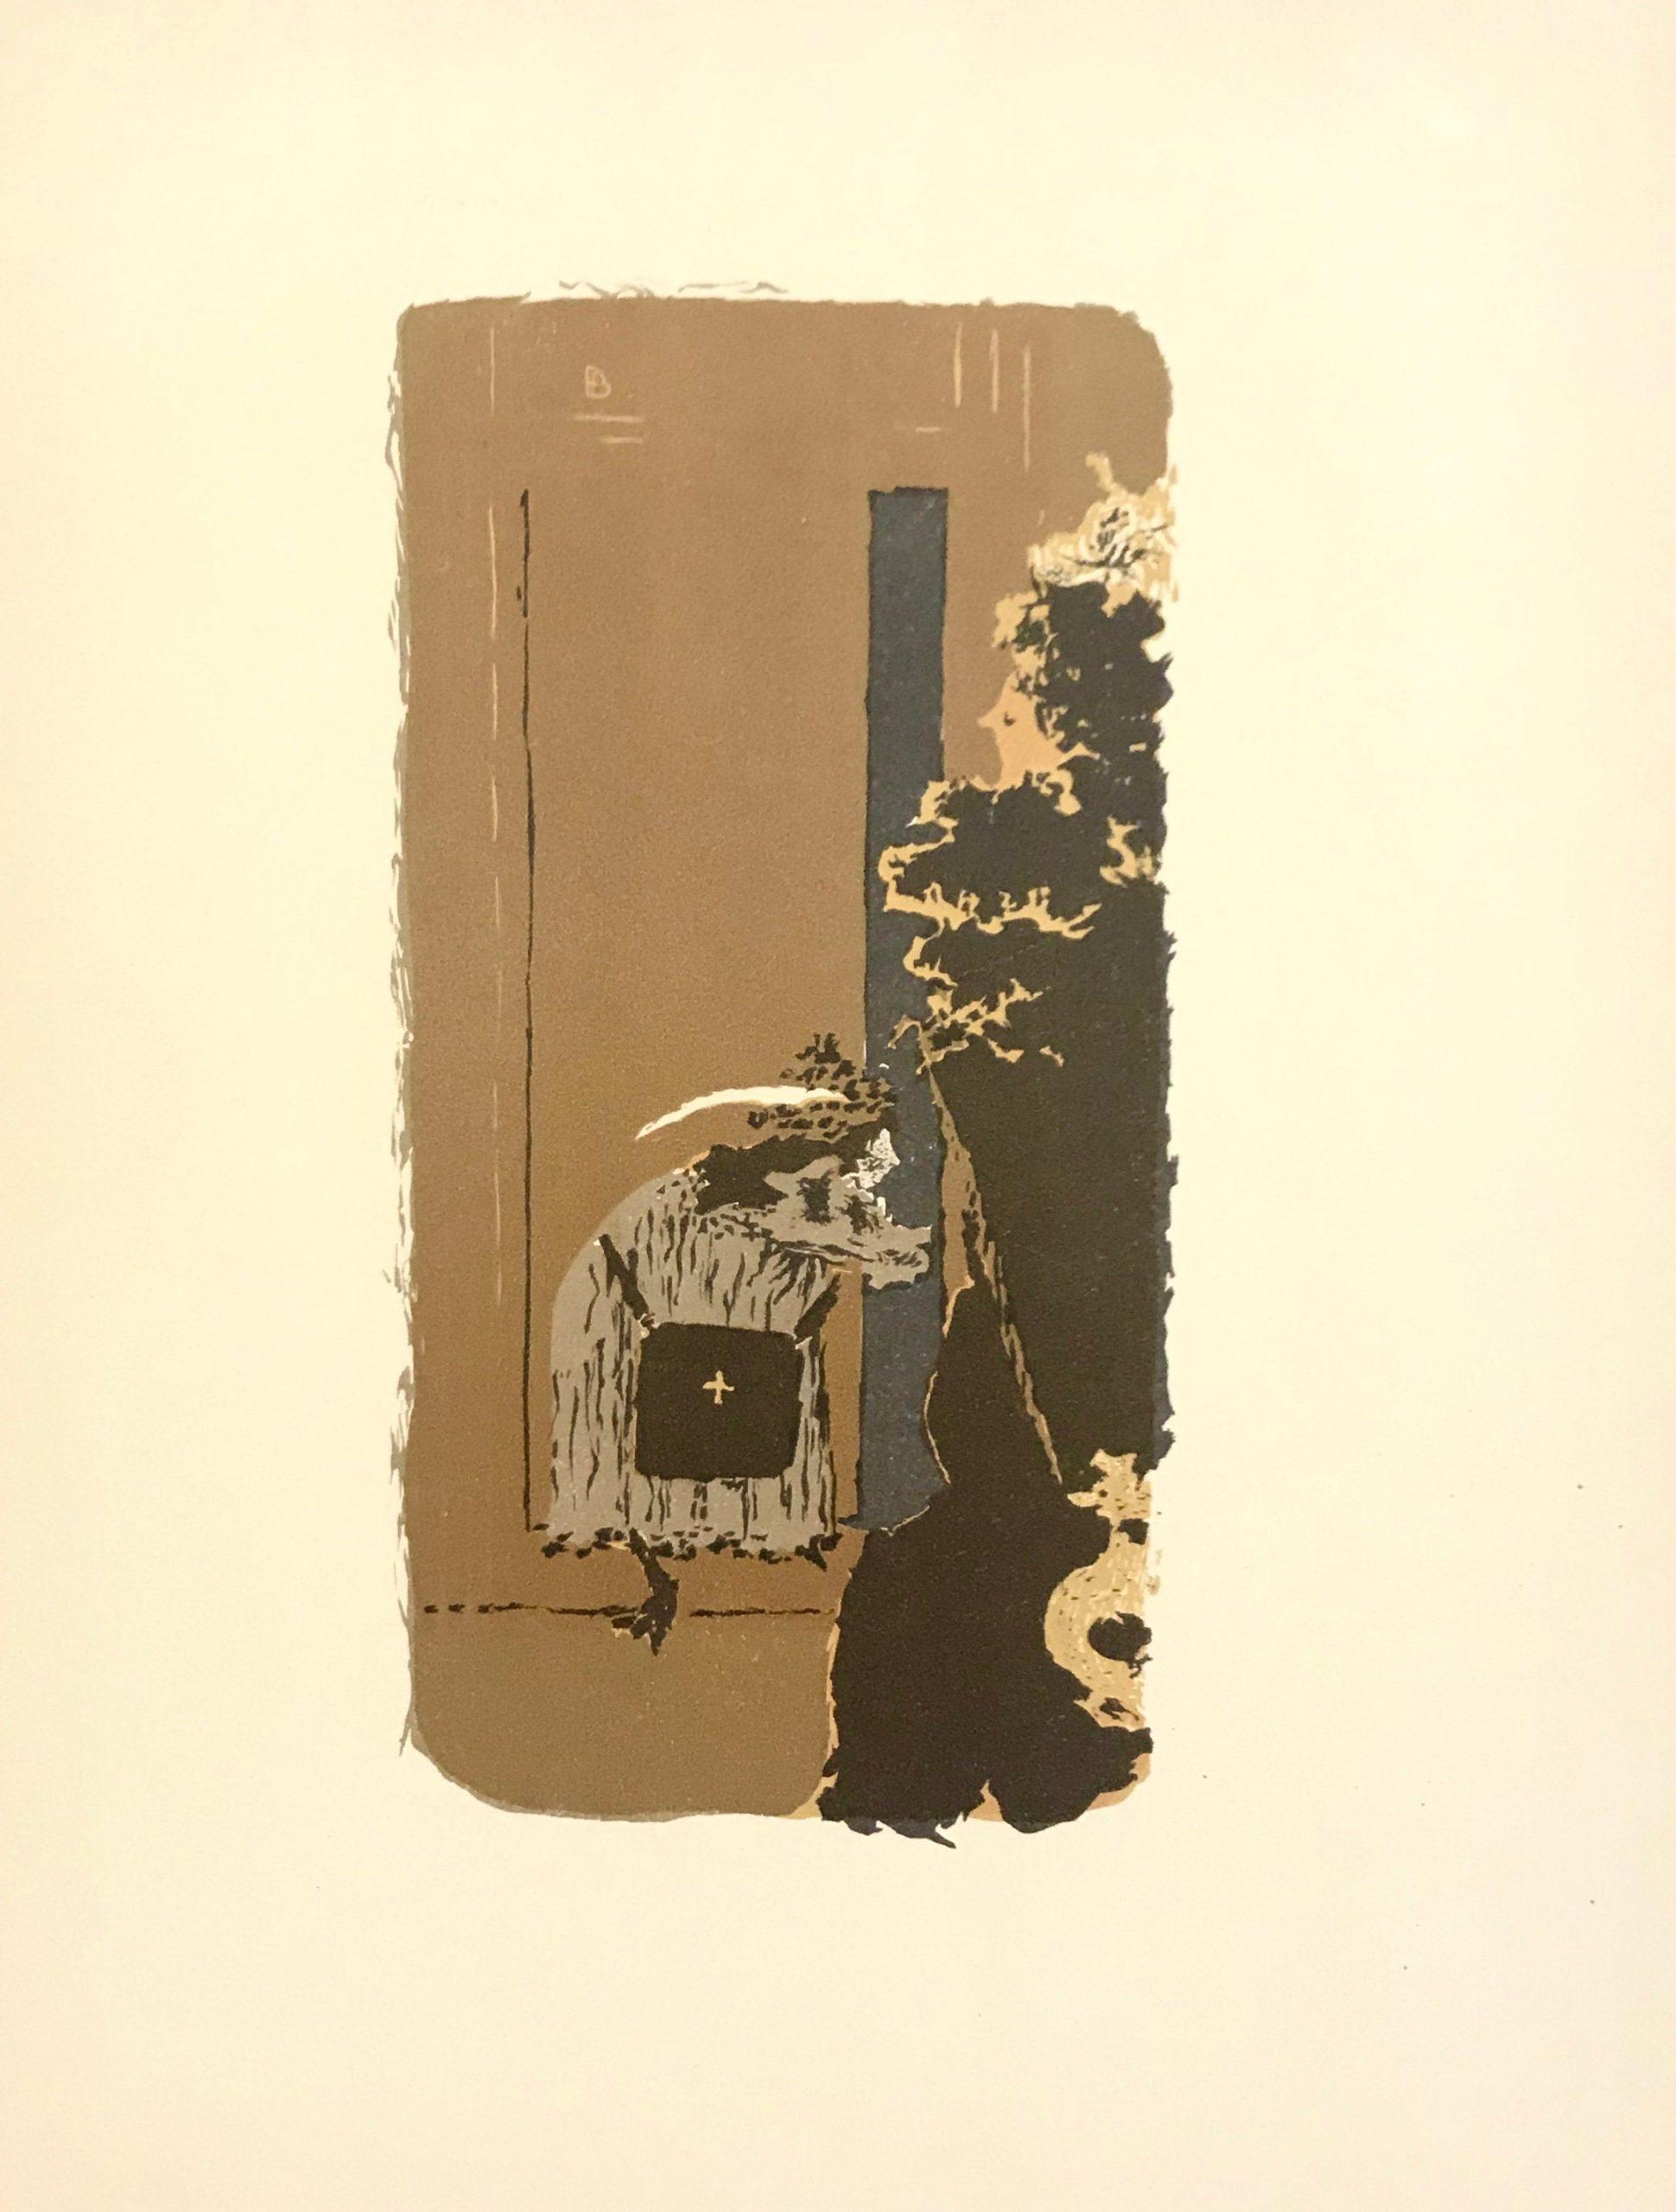 Bonnard Lithograph 46, Dans la rue 1952